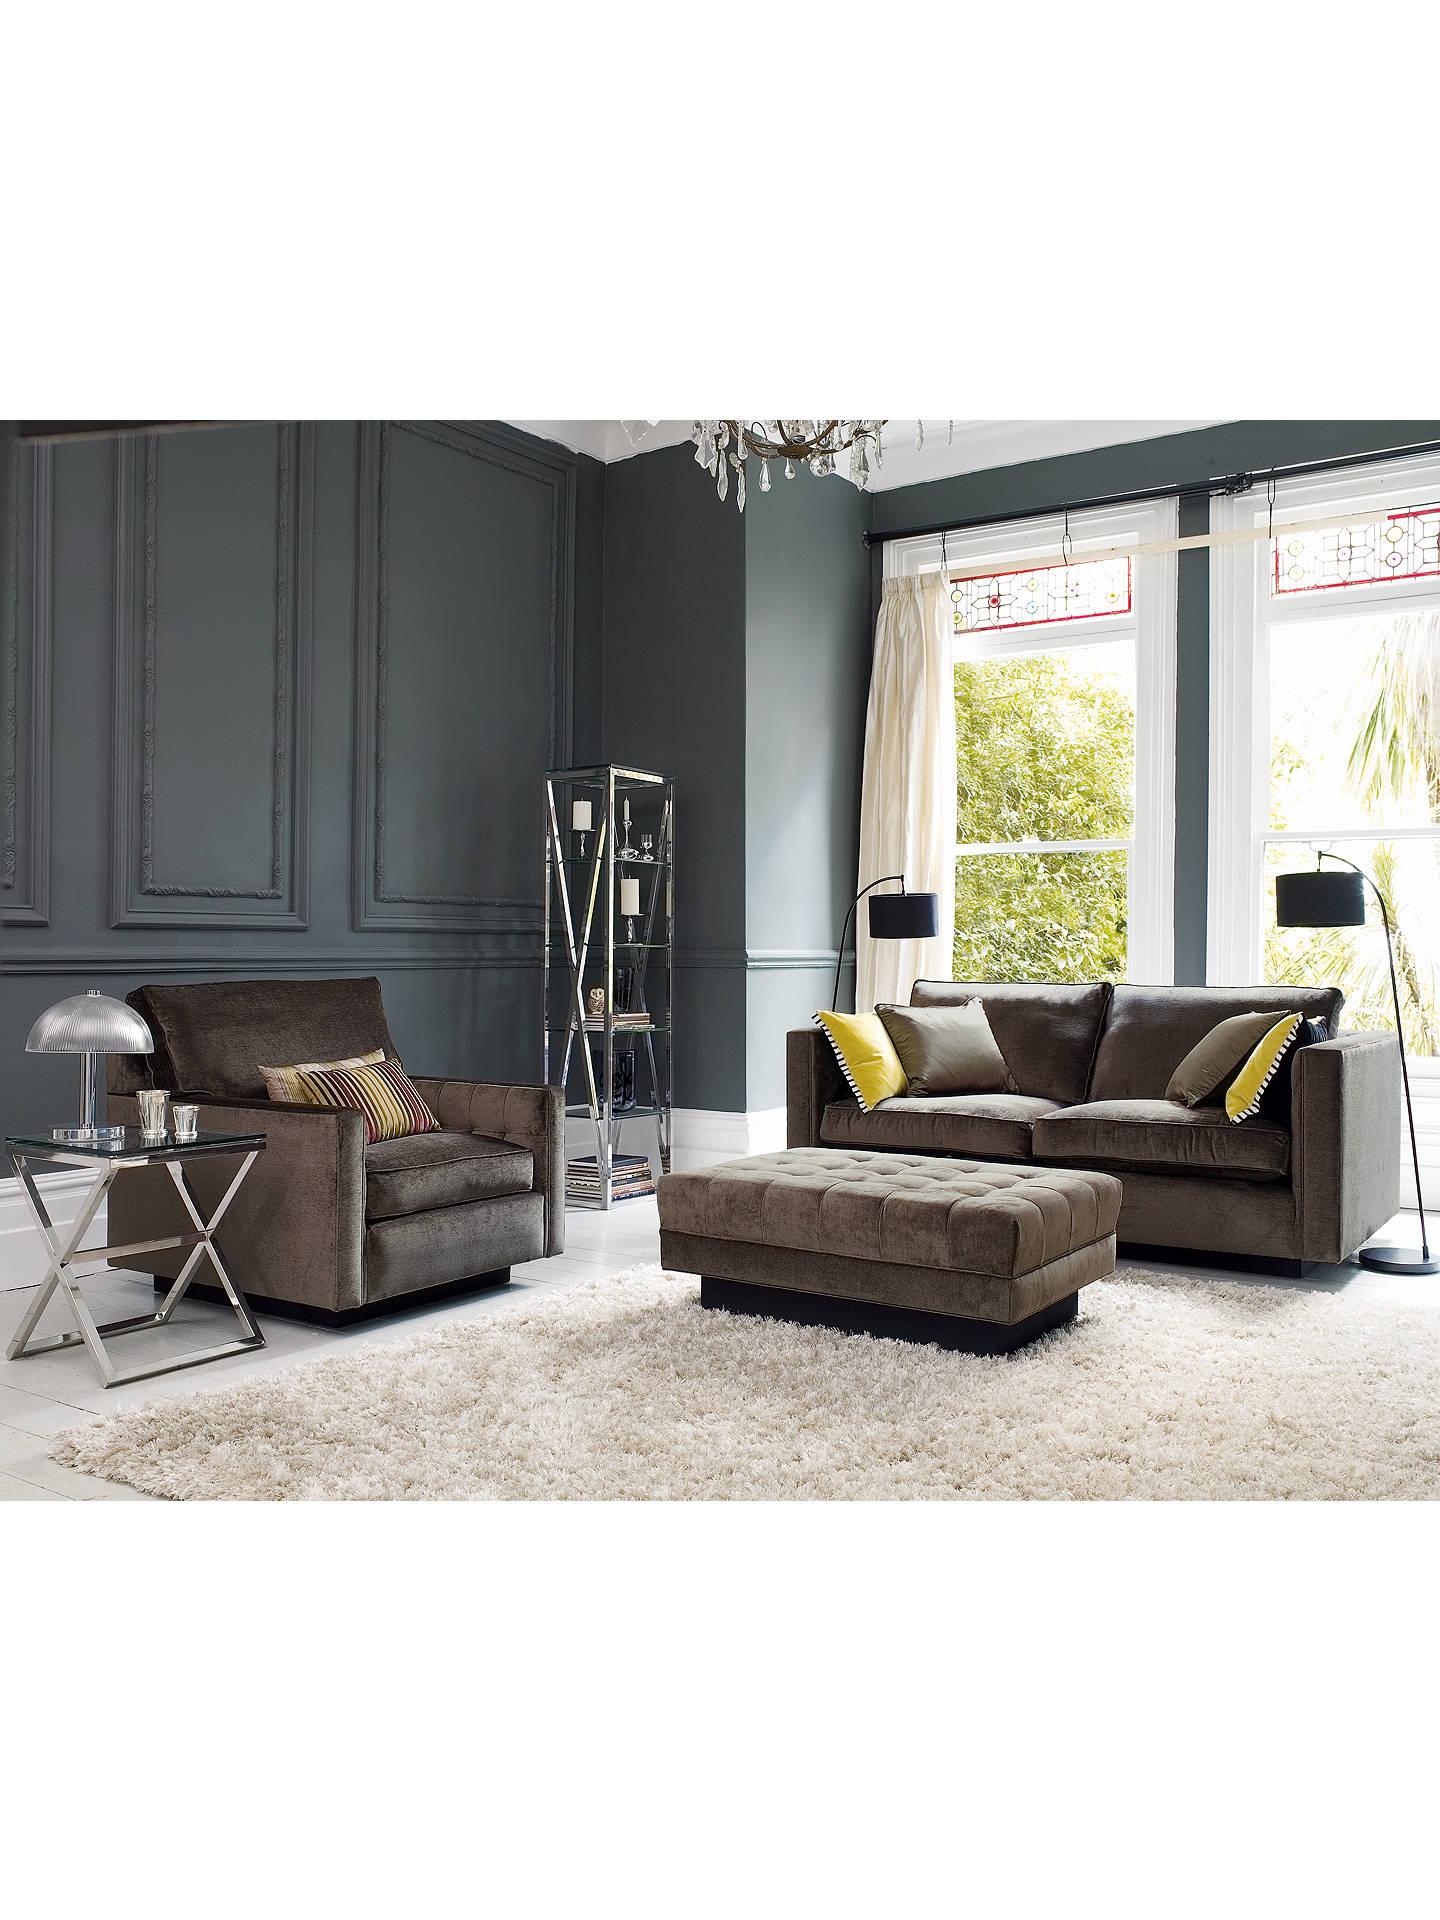 house by john lewis georgie floor lamp at john lewis. Black Bedroom Furniture Sets. Home Design Ideas